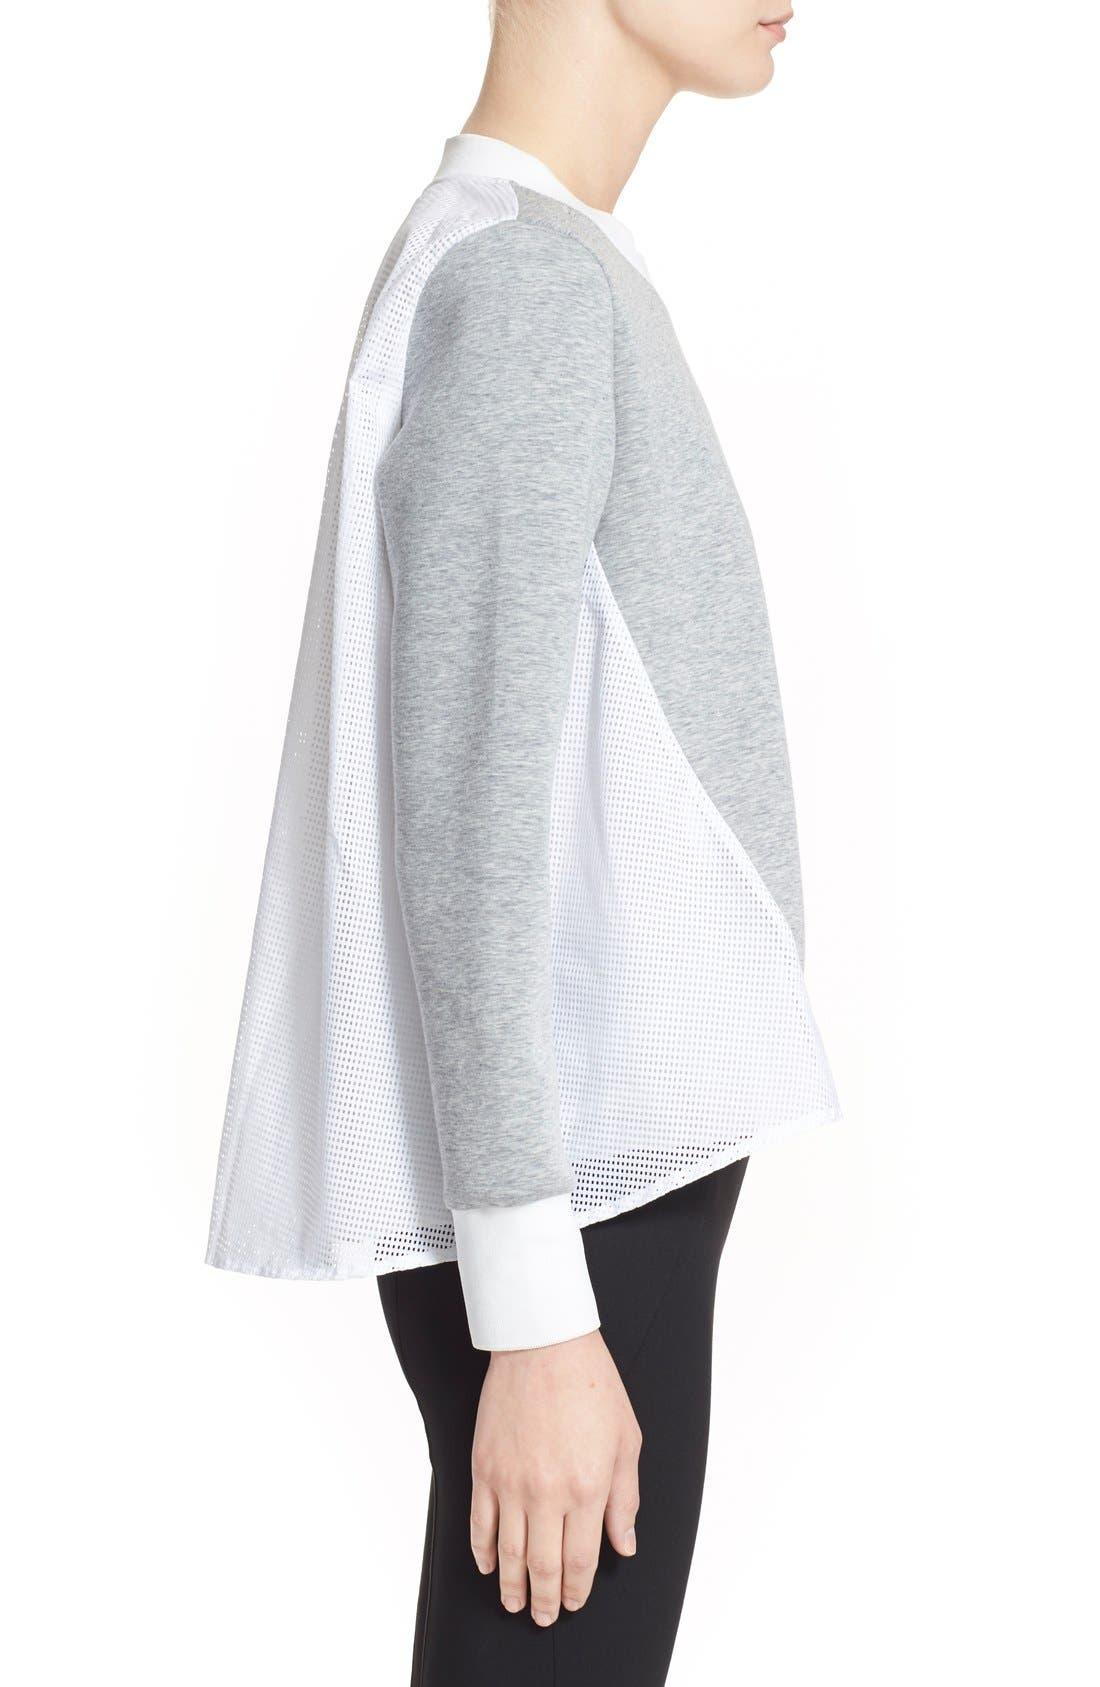 'Maglia Girocollo' Mixed Media Sweatshirt,                             Alternate thumbnail 2, color,                             021